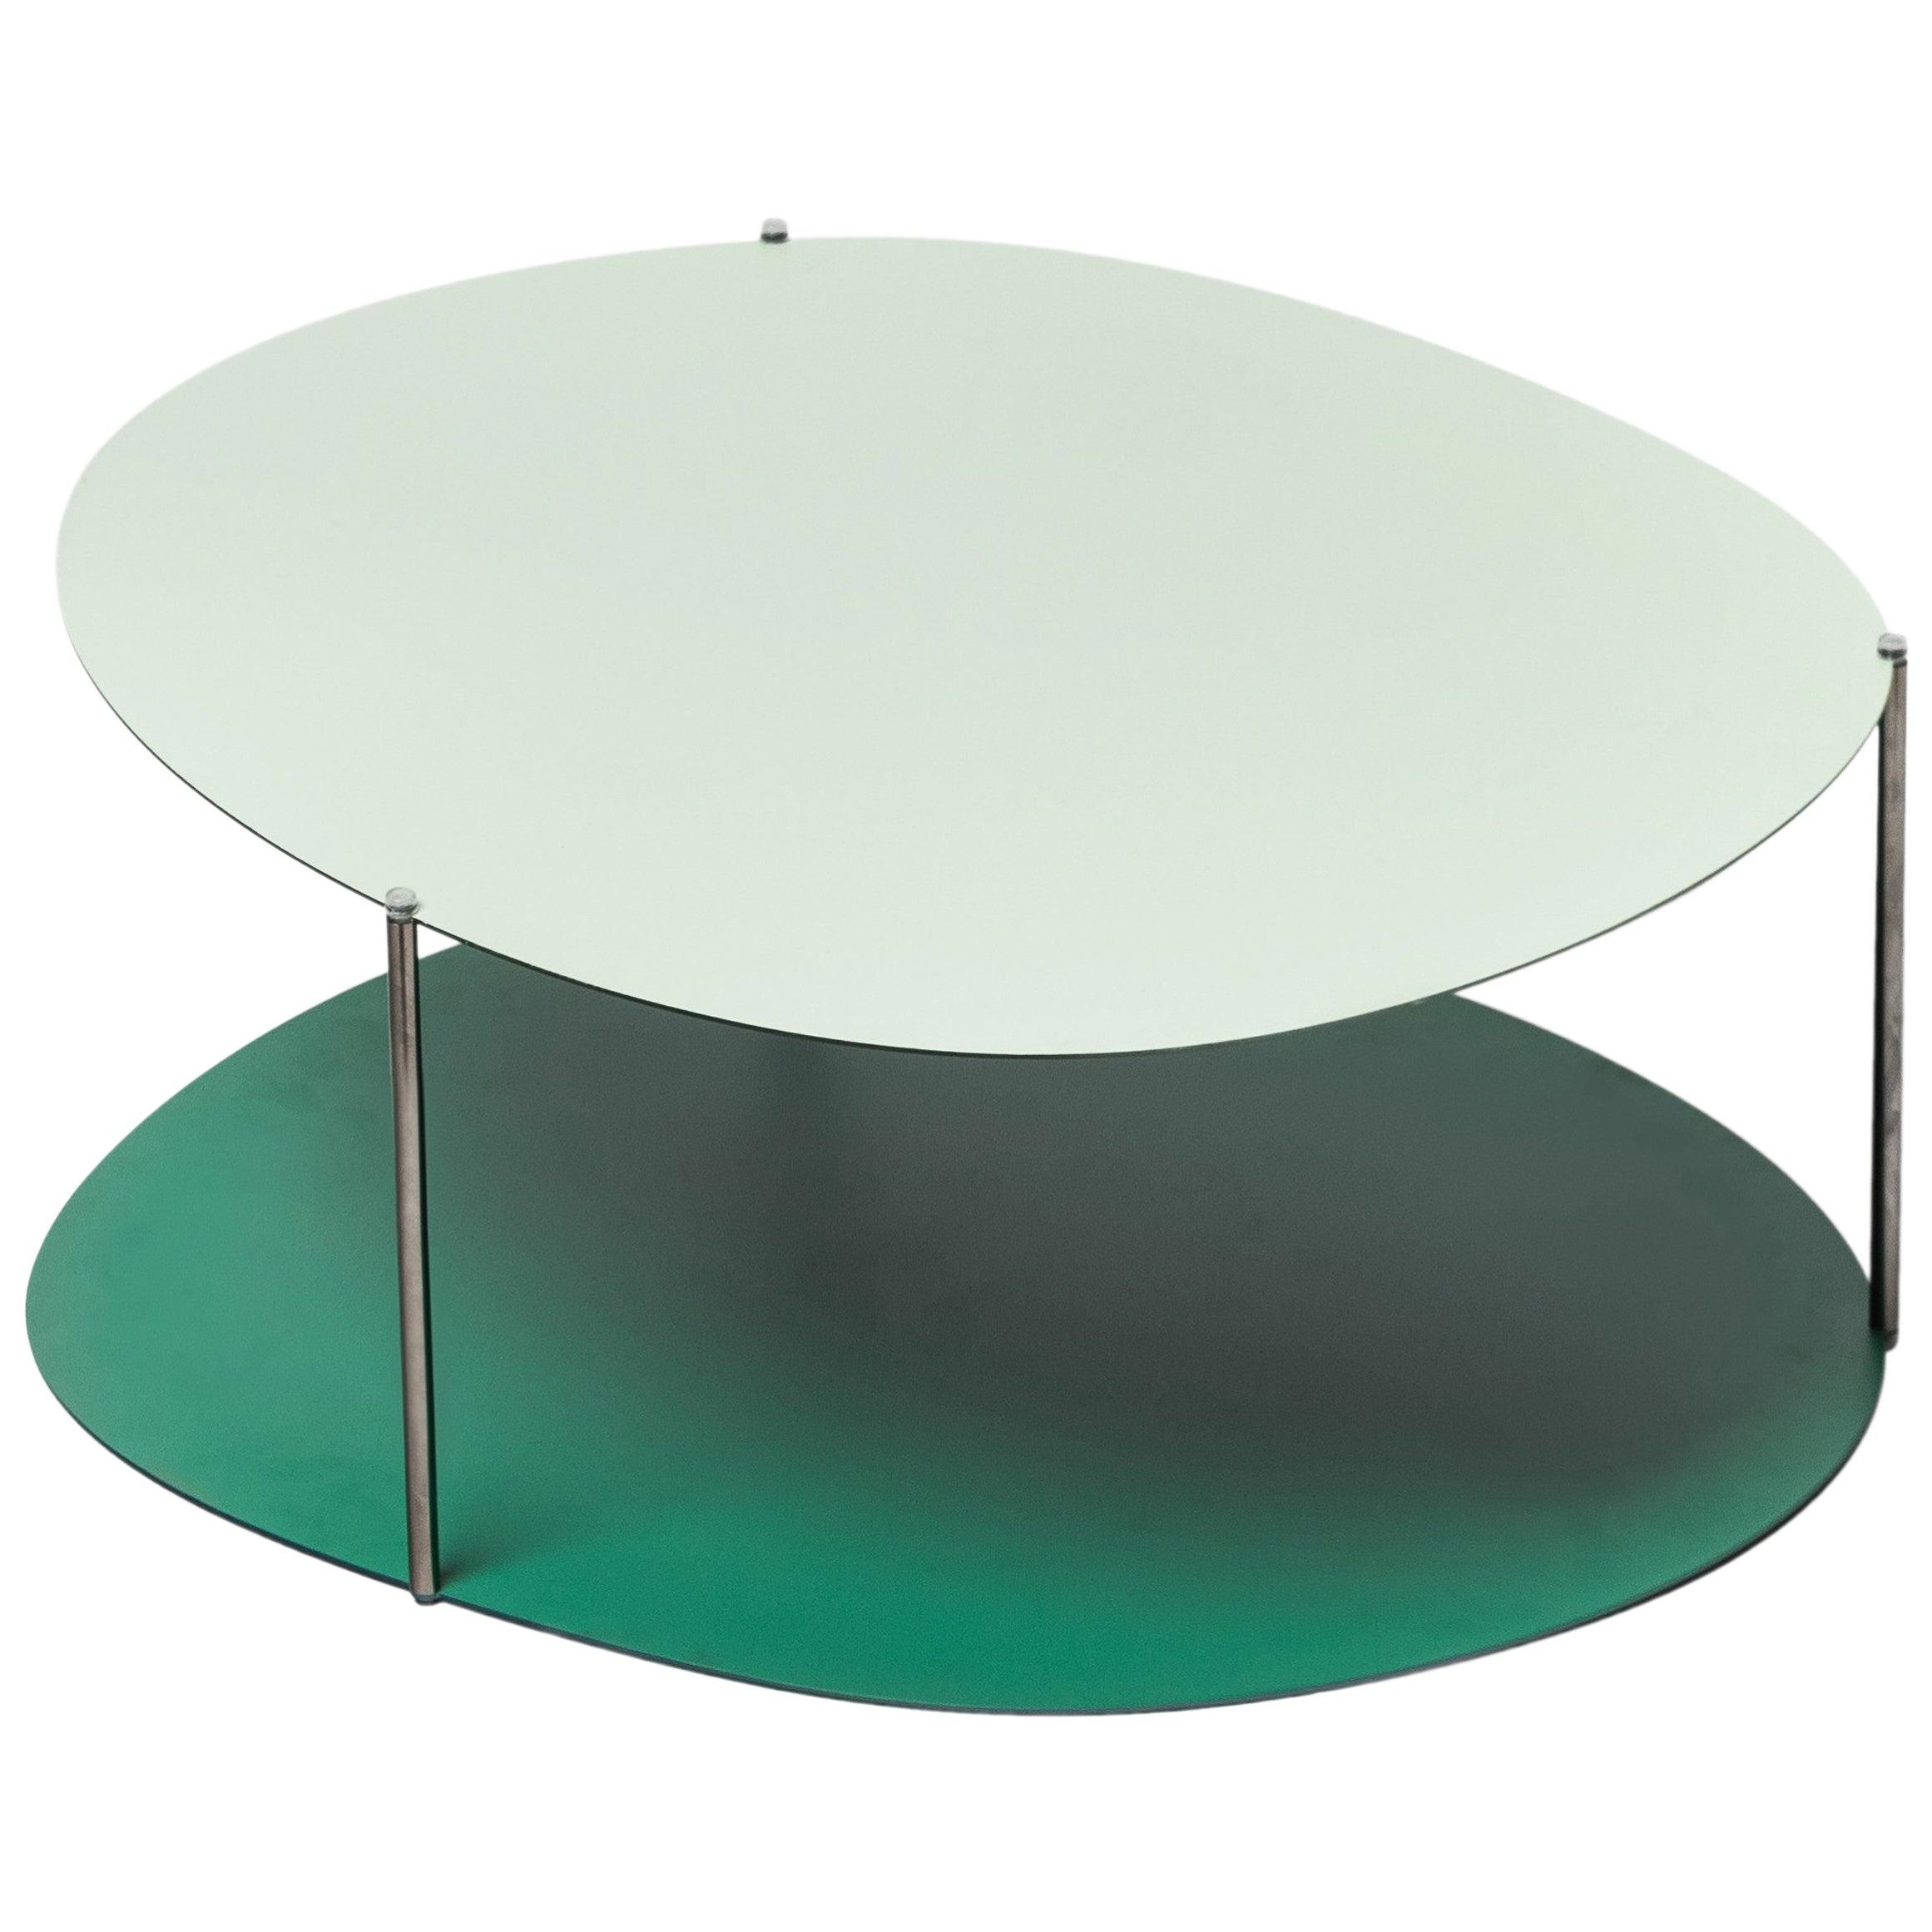 Baleri Italia Large Picos Coffee Table in Steel by Claesson Koivisto Rune